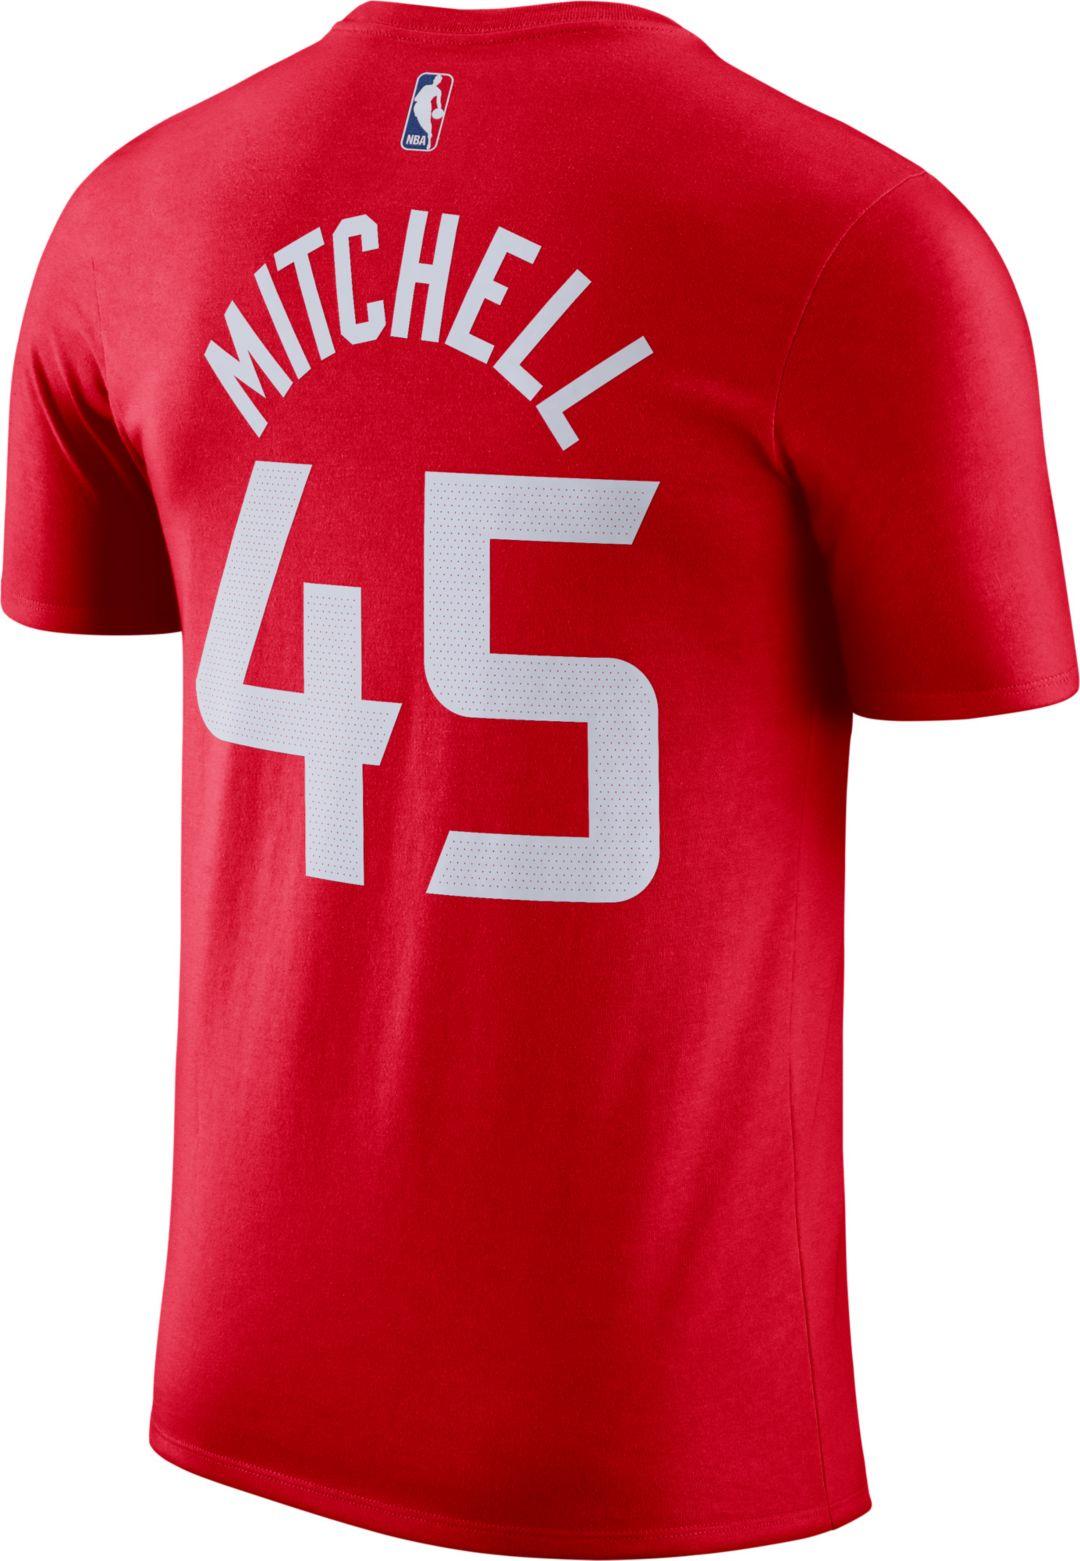 new product 91bf6 a6609 Nike Men's Utah Jazz Donovan Mitchell Dri-FIT City Edition T-Shirt